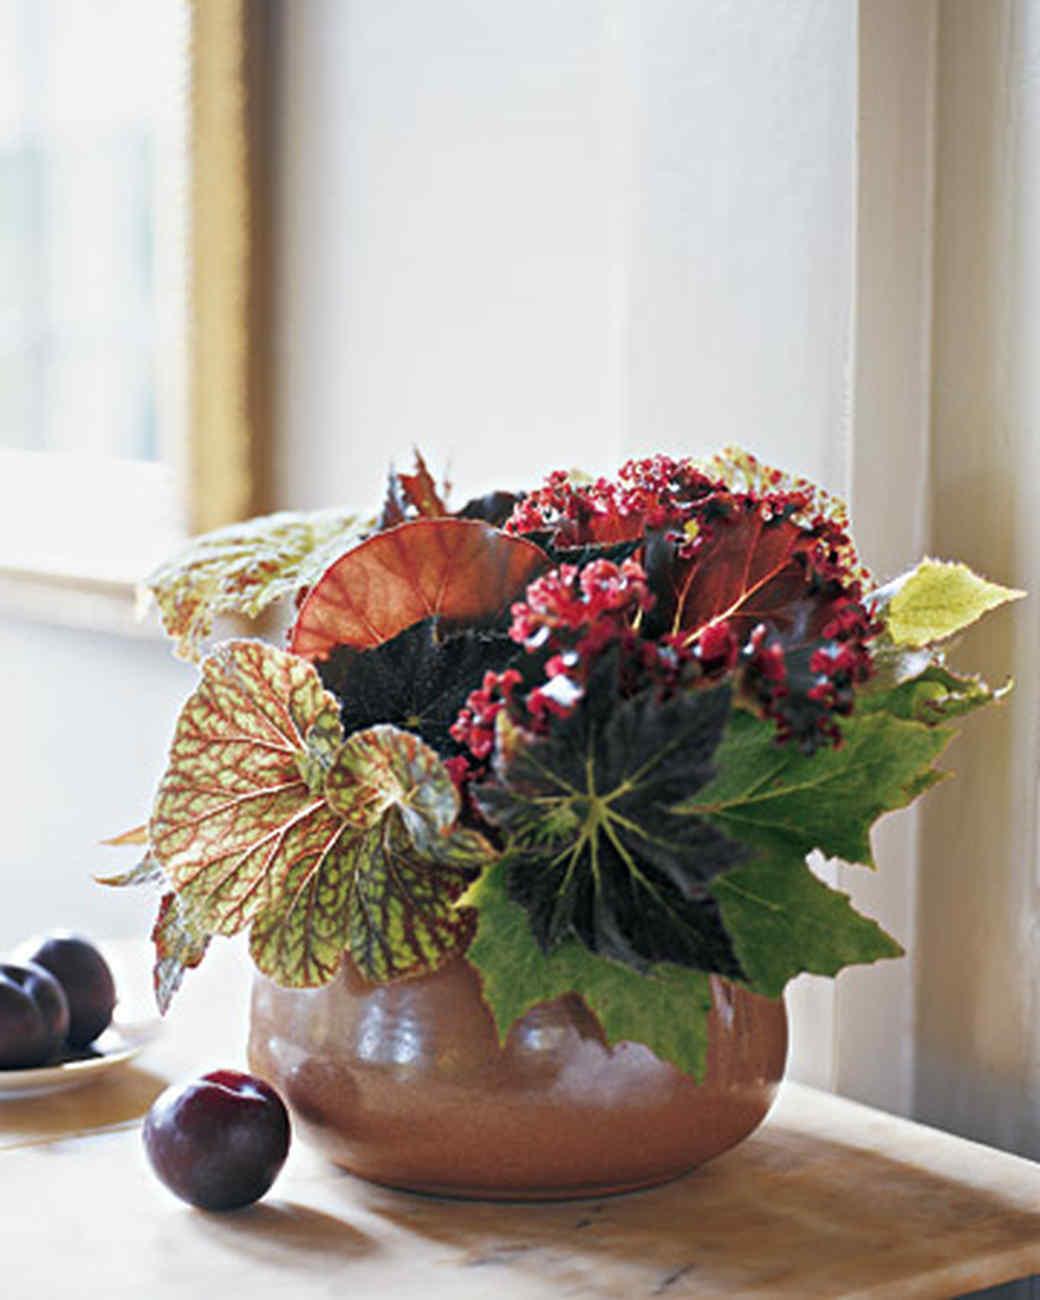 floral arrangements with fruit in vase of marthas flower arranging secrets martha stewart throughout lesson 2